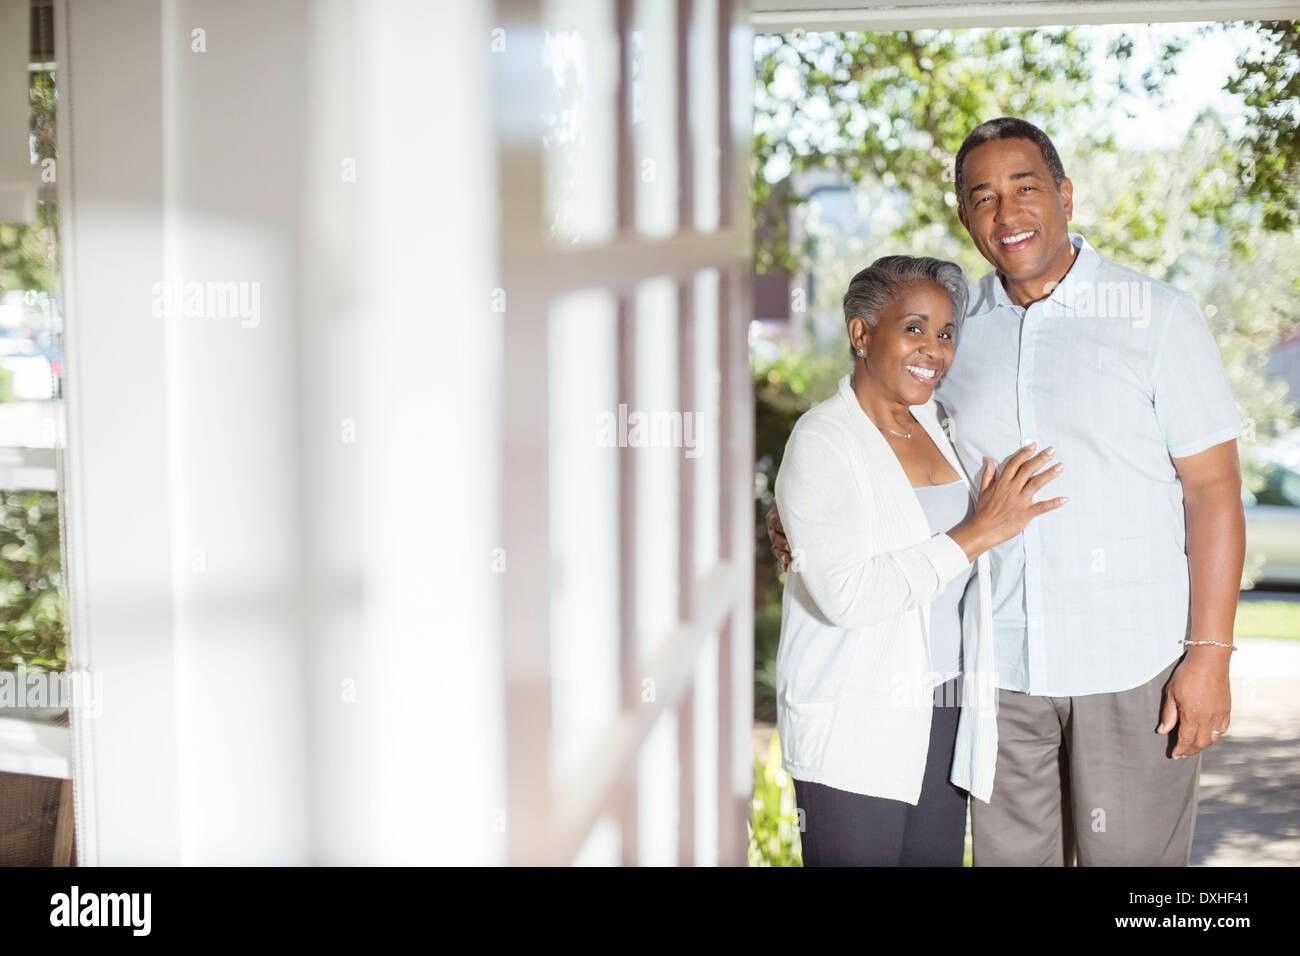 Porträt des Lächelns älteres Paar in Tür Stockbild